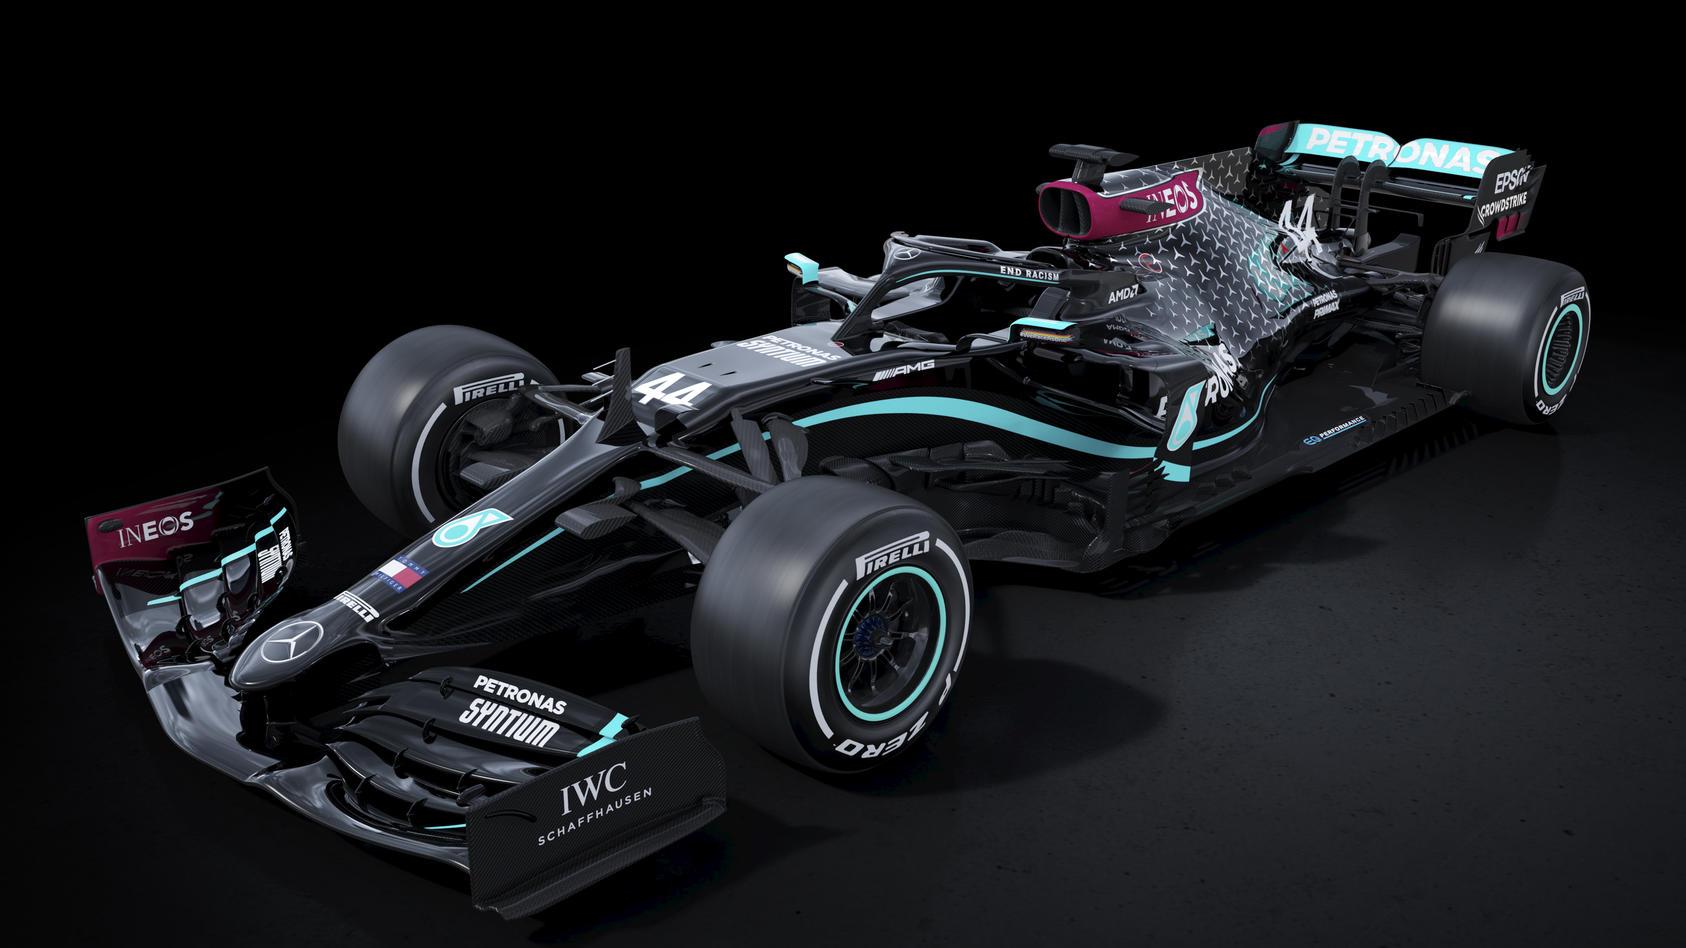 Silver Arrows return to racing with renewed purpose. Lewis Hamilton's F1 car.